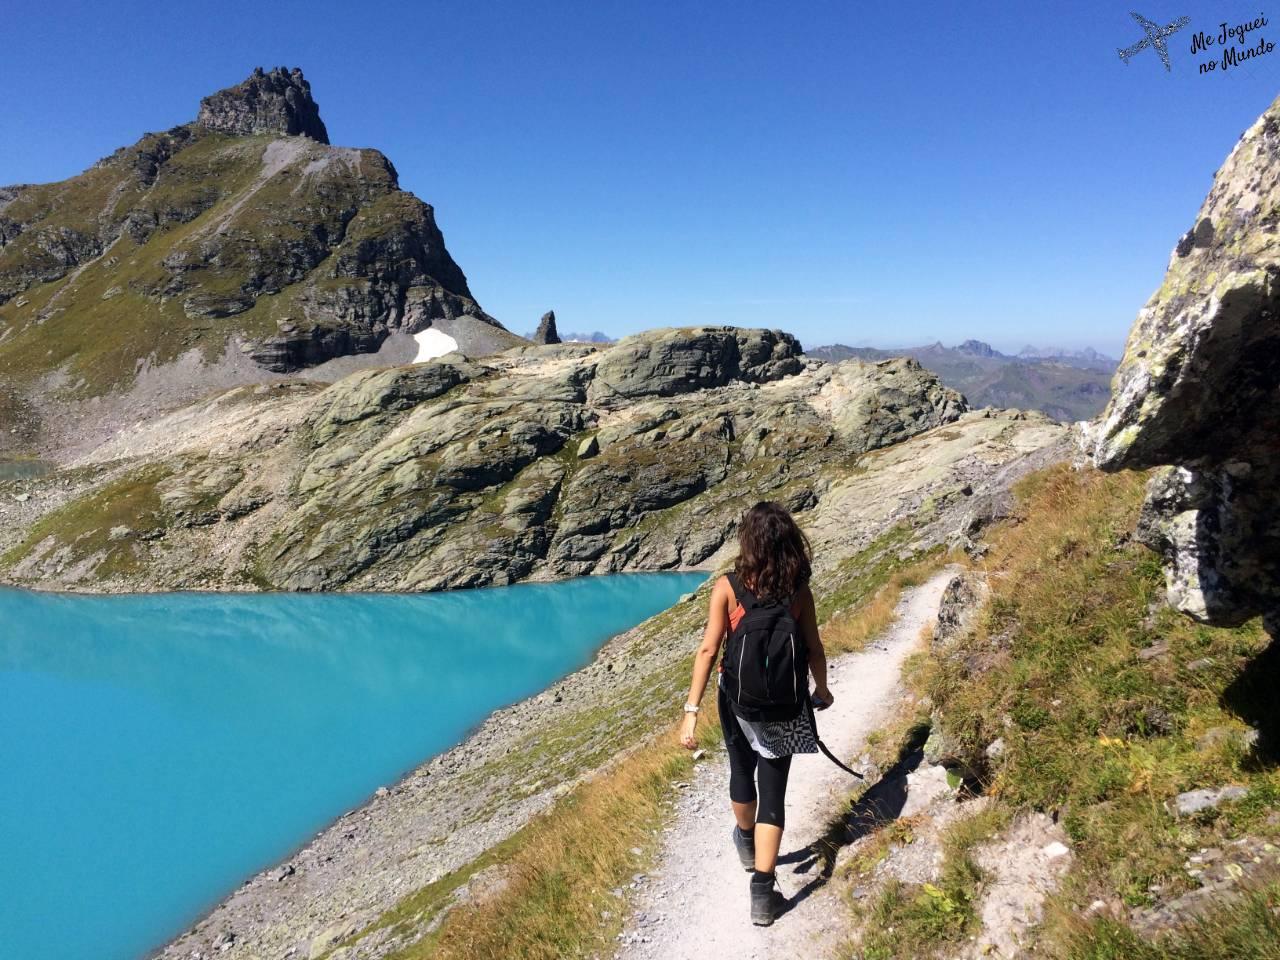 trilha dos 5 lagos suiça